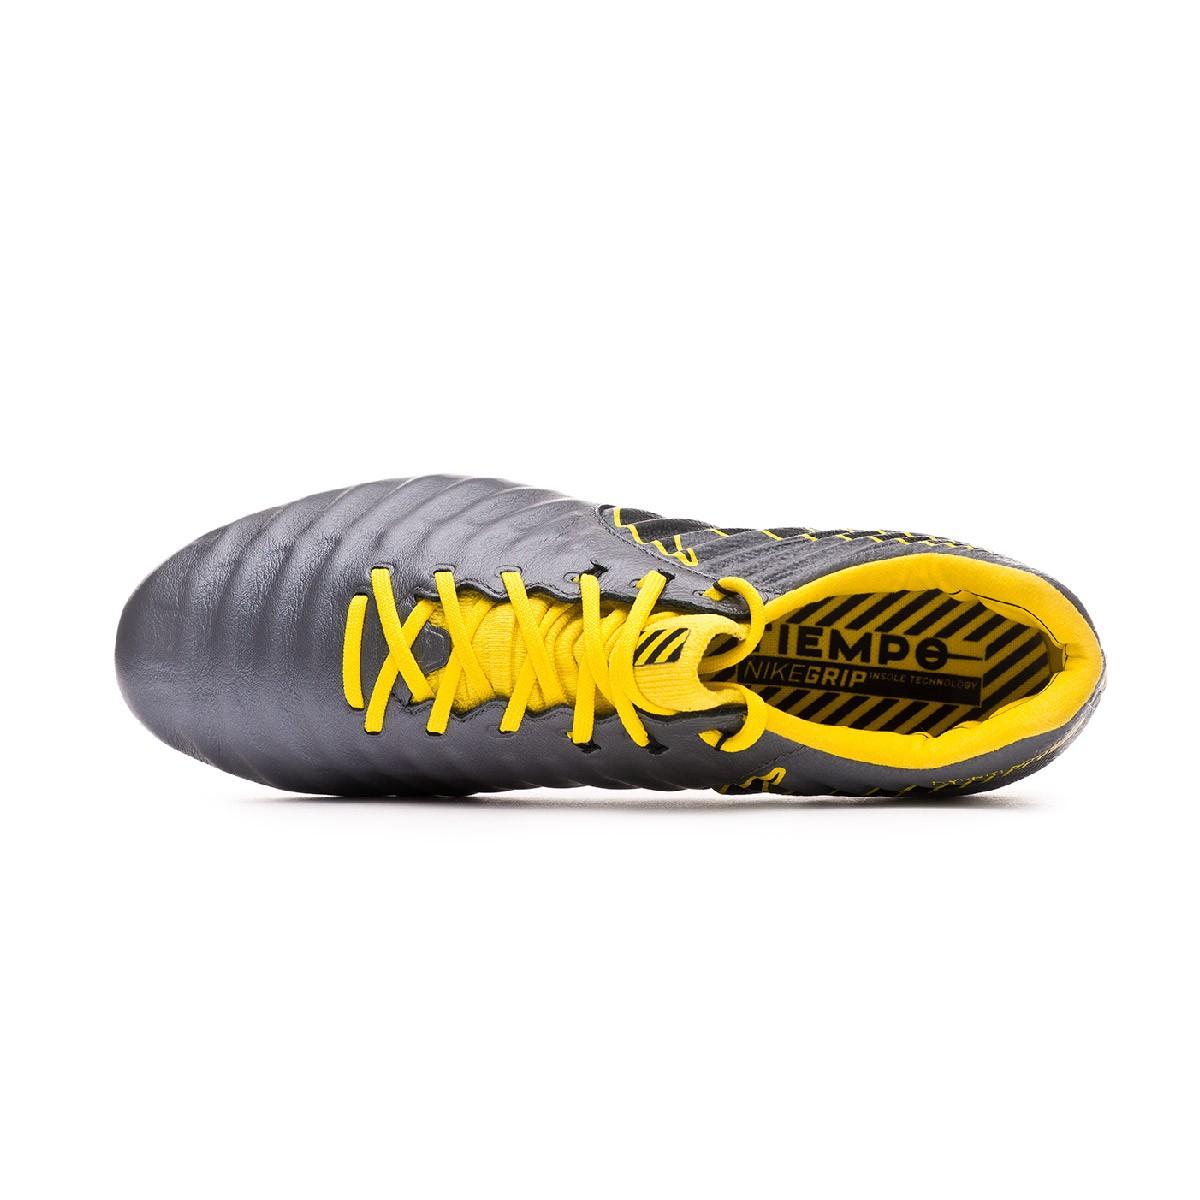 ffeae38af Football Boots Nike Tiempo Legend VII Elite Anti-Clog SG-Pro Dark grey-Optical  yellow-Black - Tienda de fútbol Fútbol Emotion